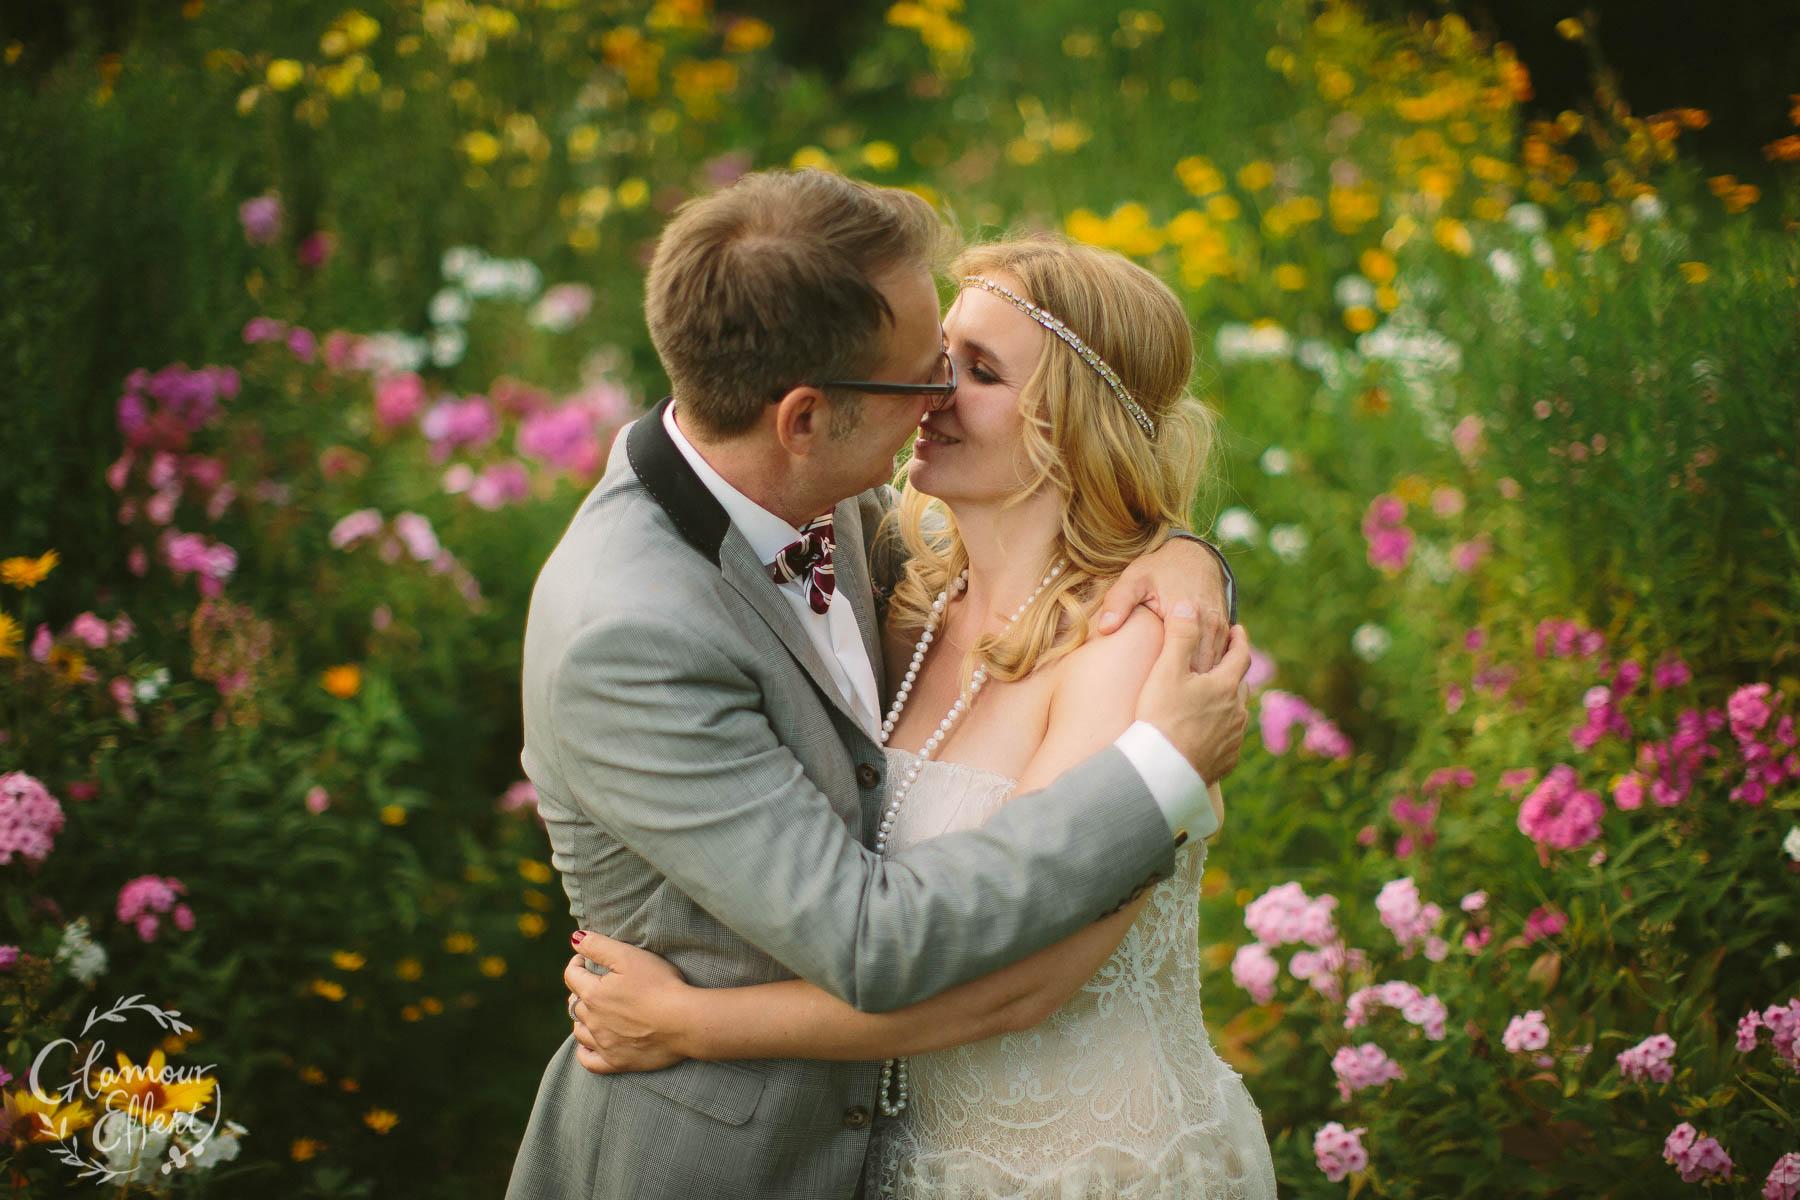 Gartenglück Gut Wegendorf - Hochzeit Romy & Stefan